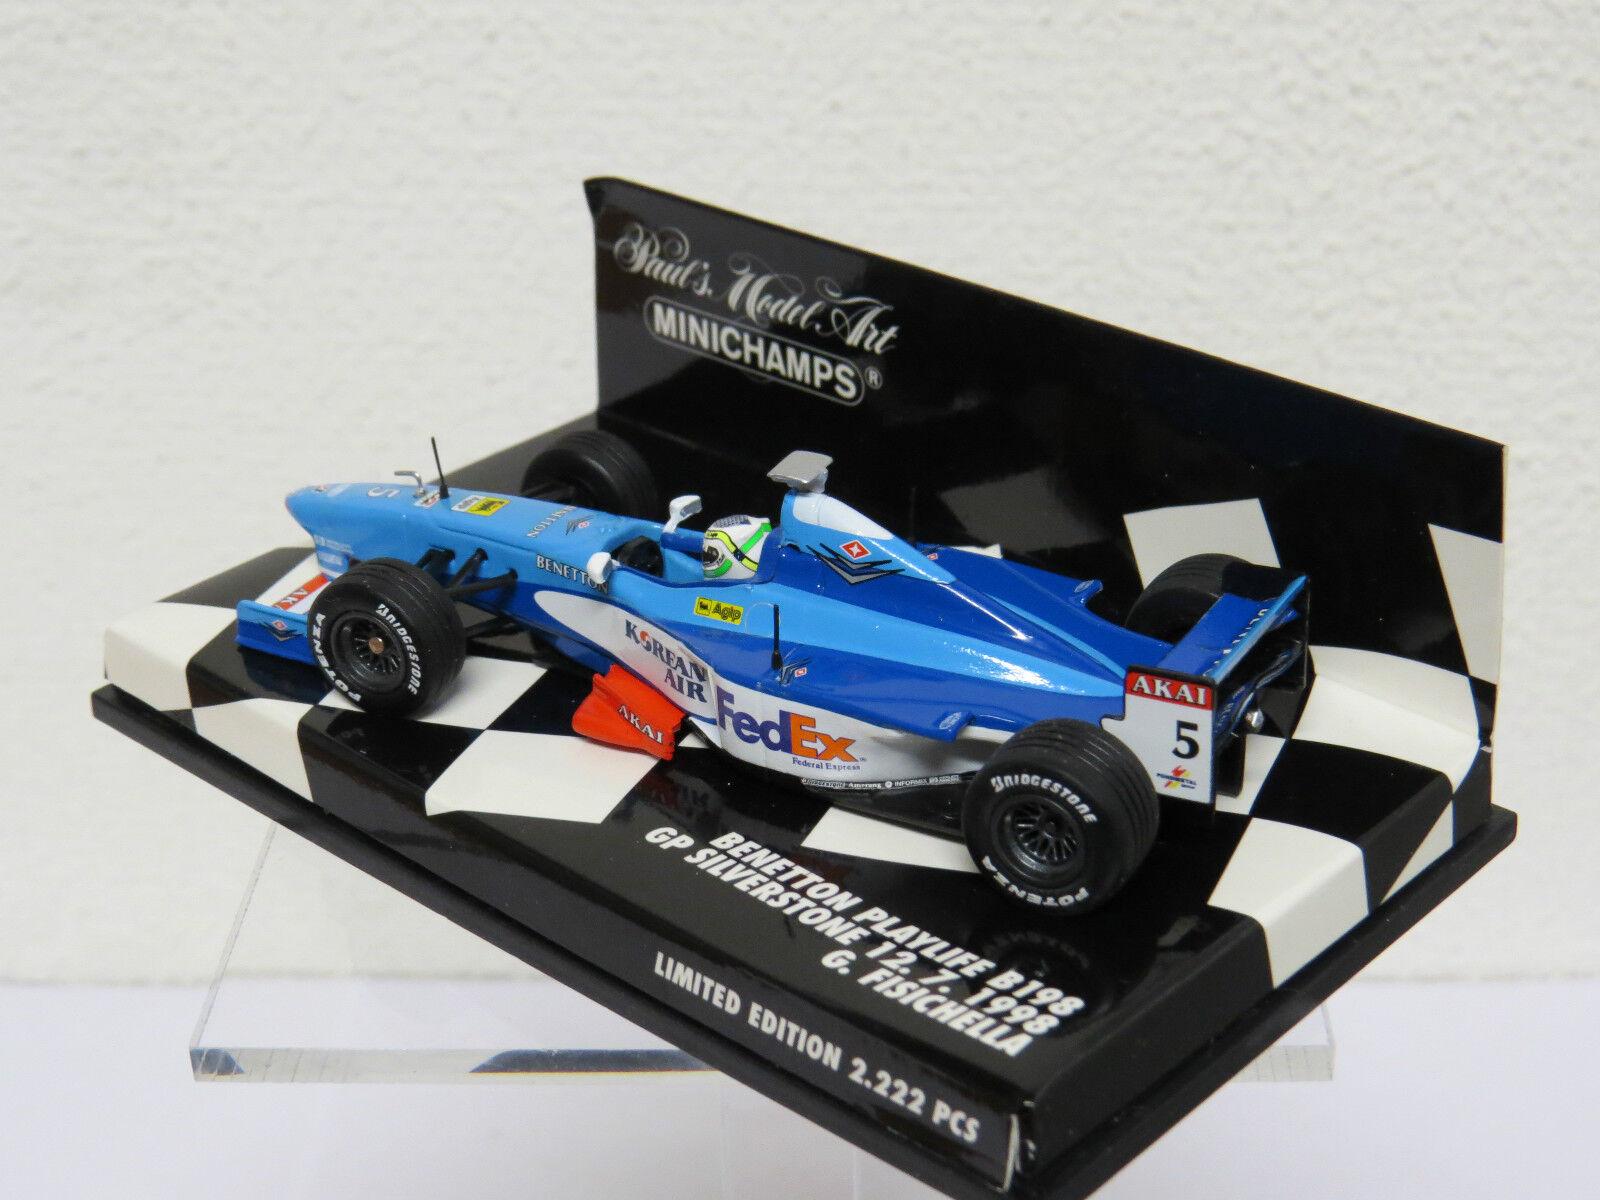 Benetton B198 GP GP GP platastone 12. 7. 1998 G. Fisichella Minichamps Nr. 430980075 974a56